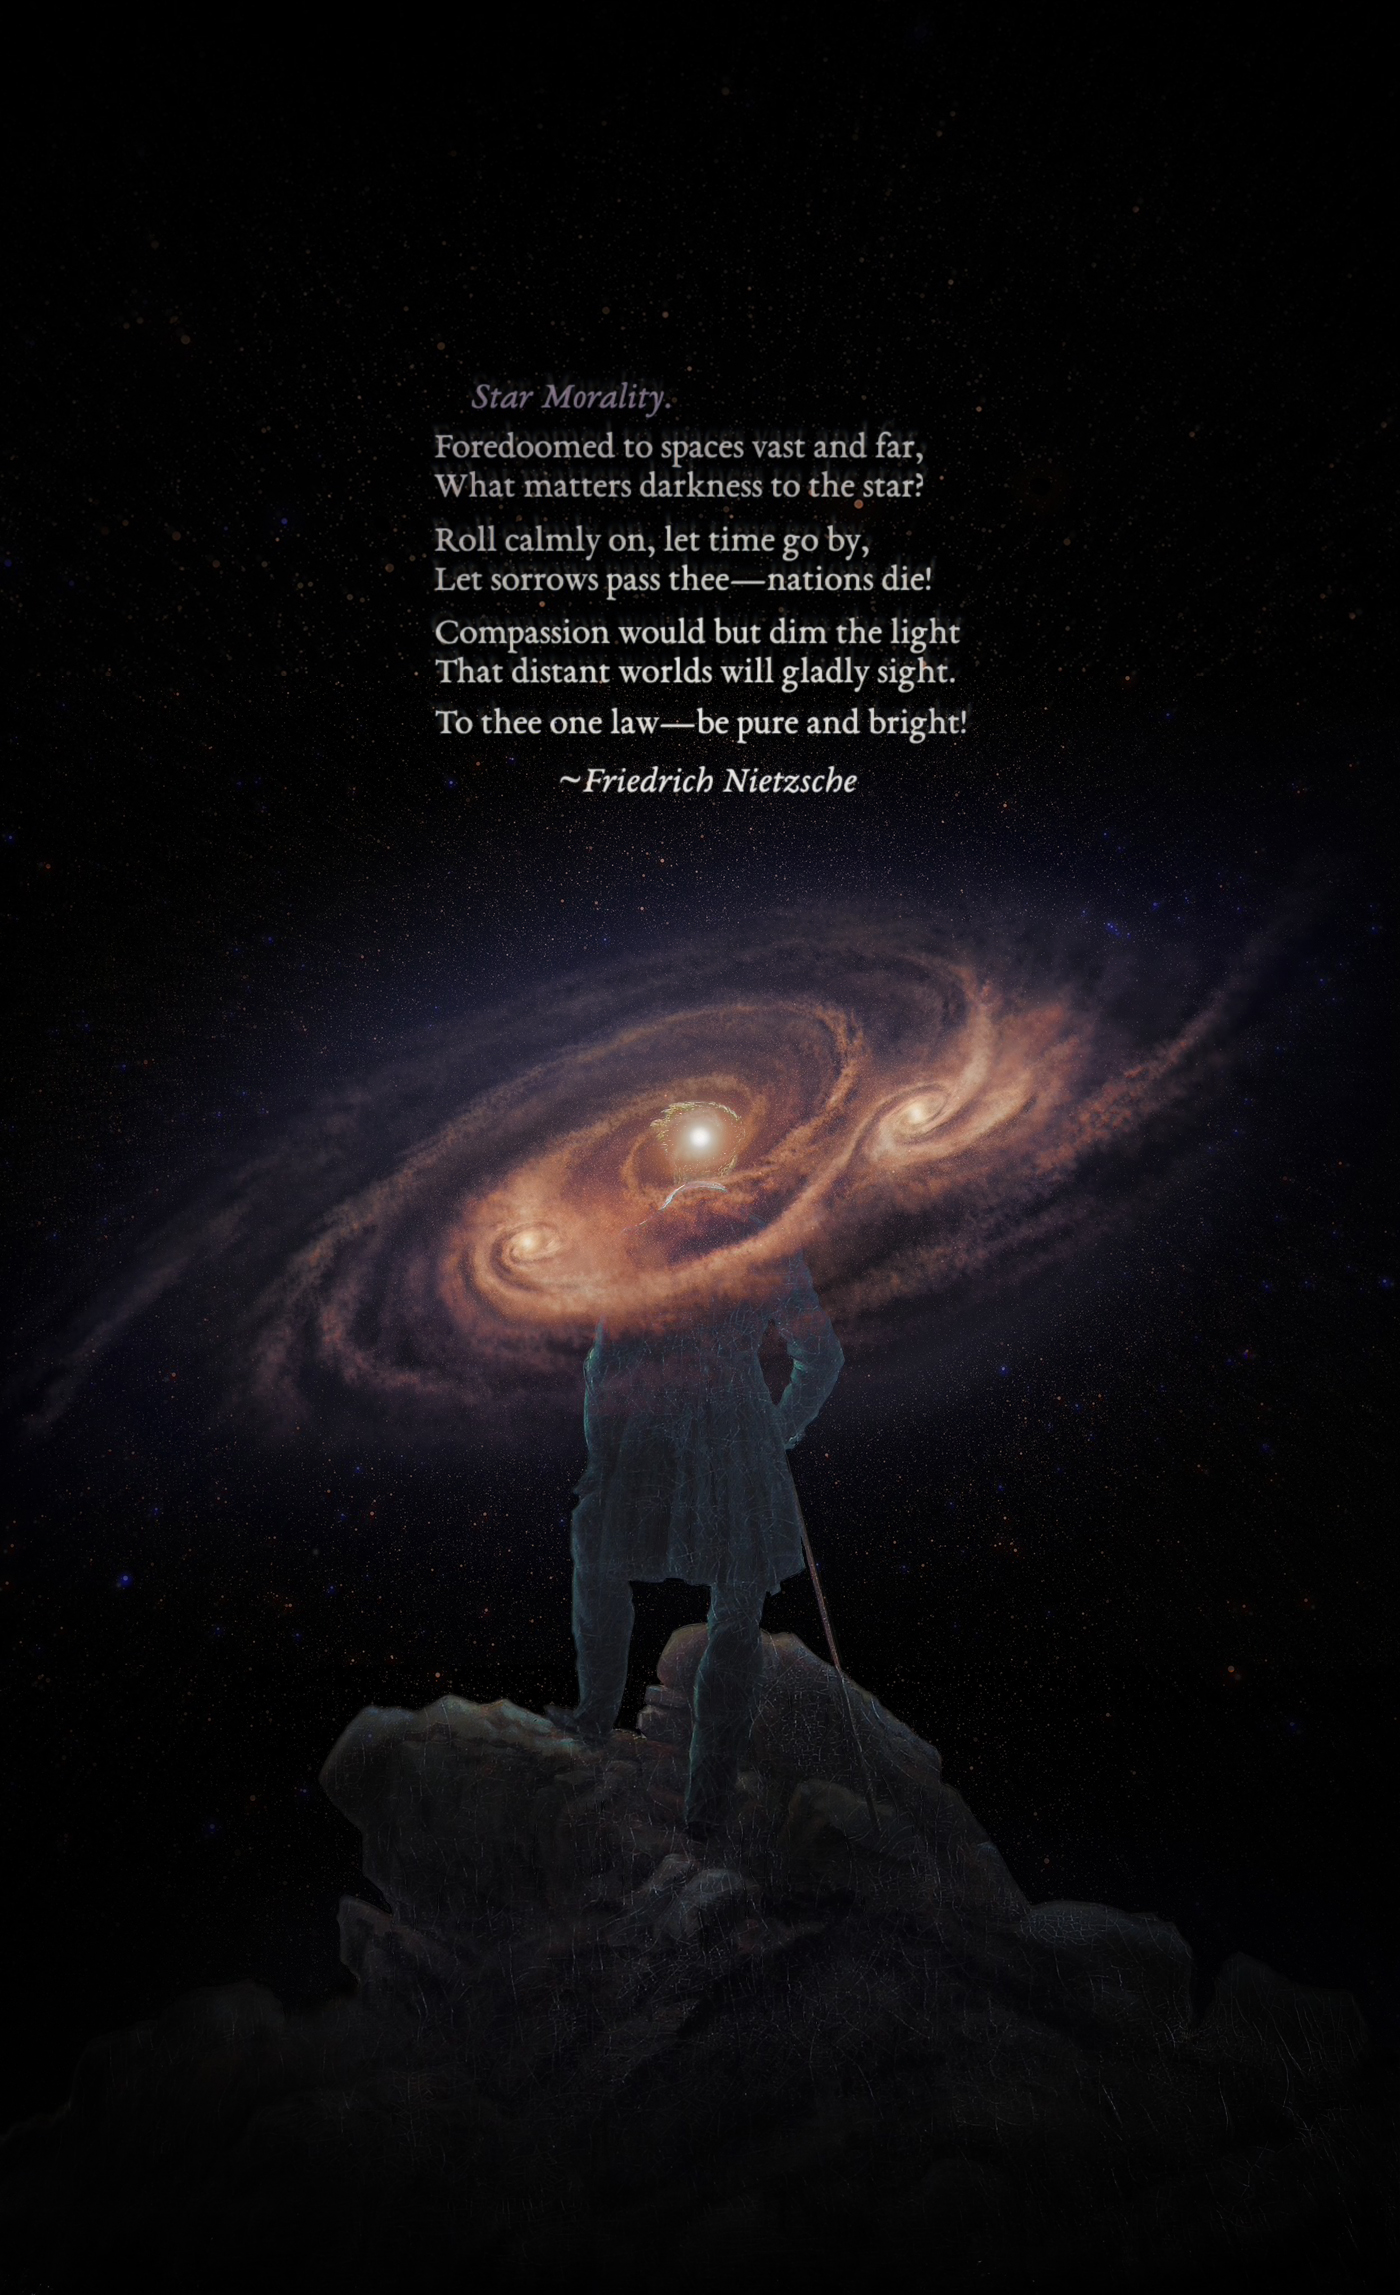 Star Morality — Friedrich Nietzsche [1400 x 2295] [OC]